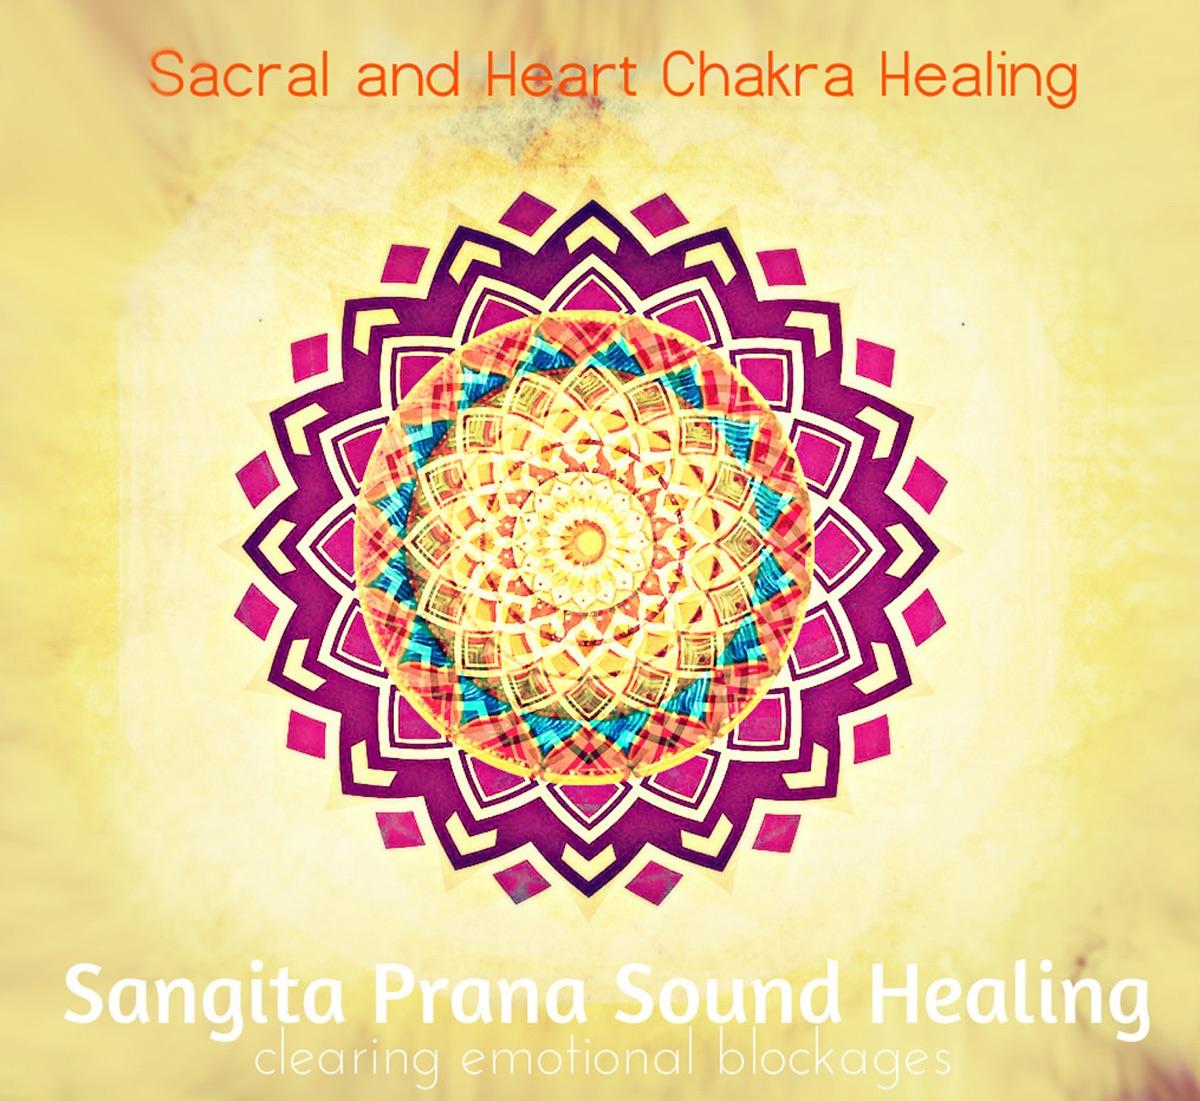 Sacral and Heart Chakra Healing Album Cover by Sangita Prana